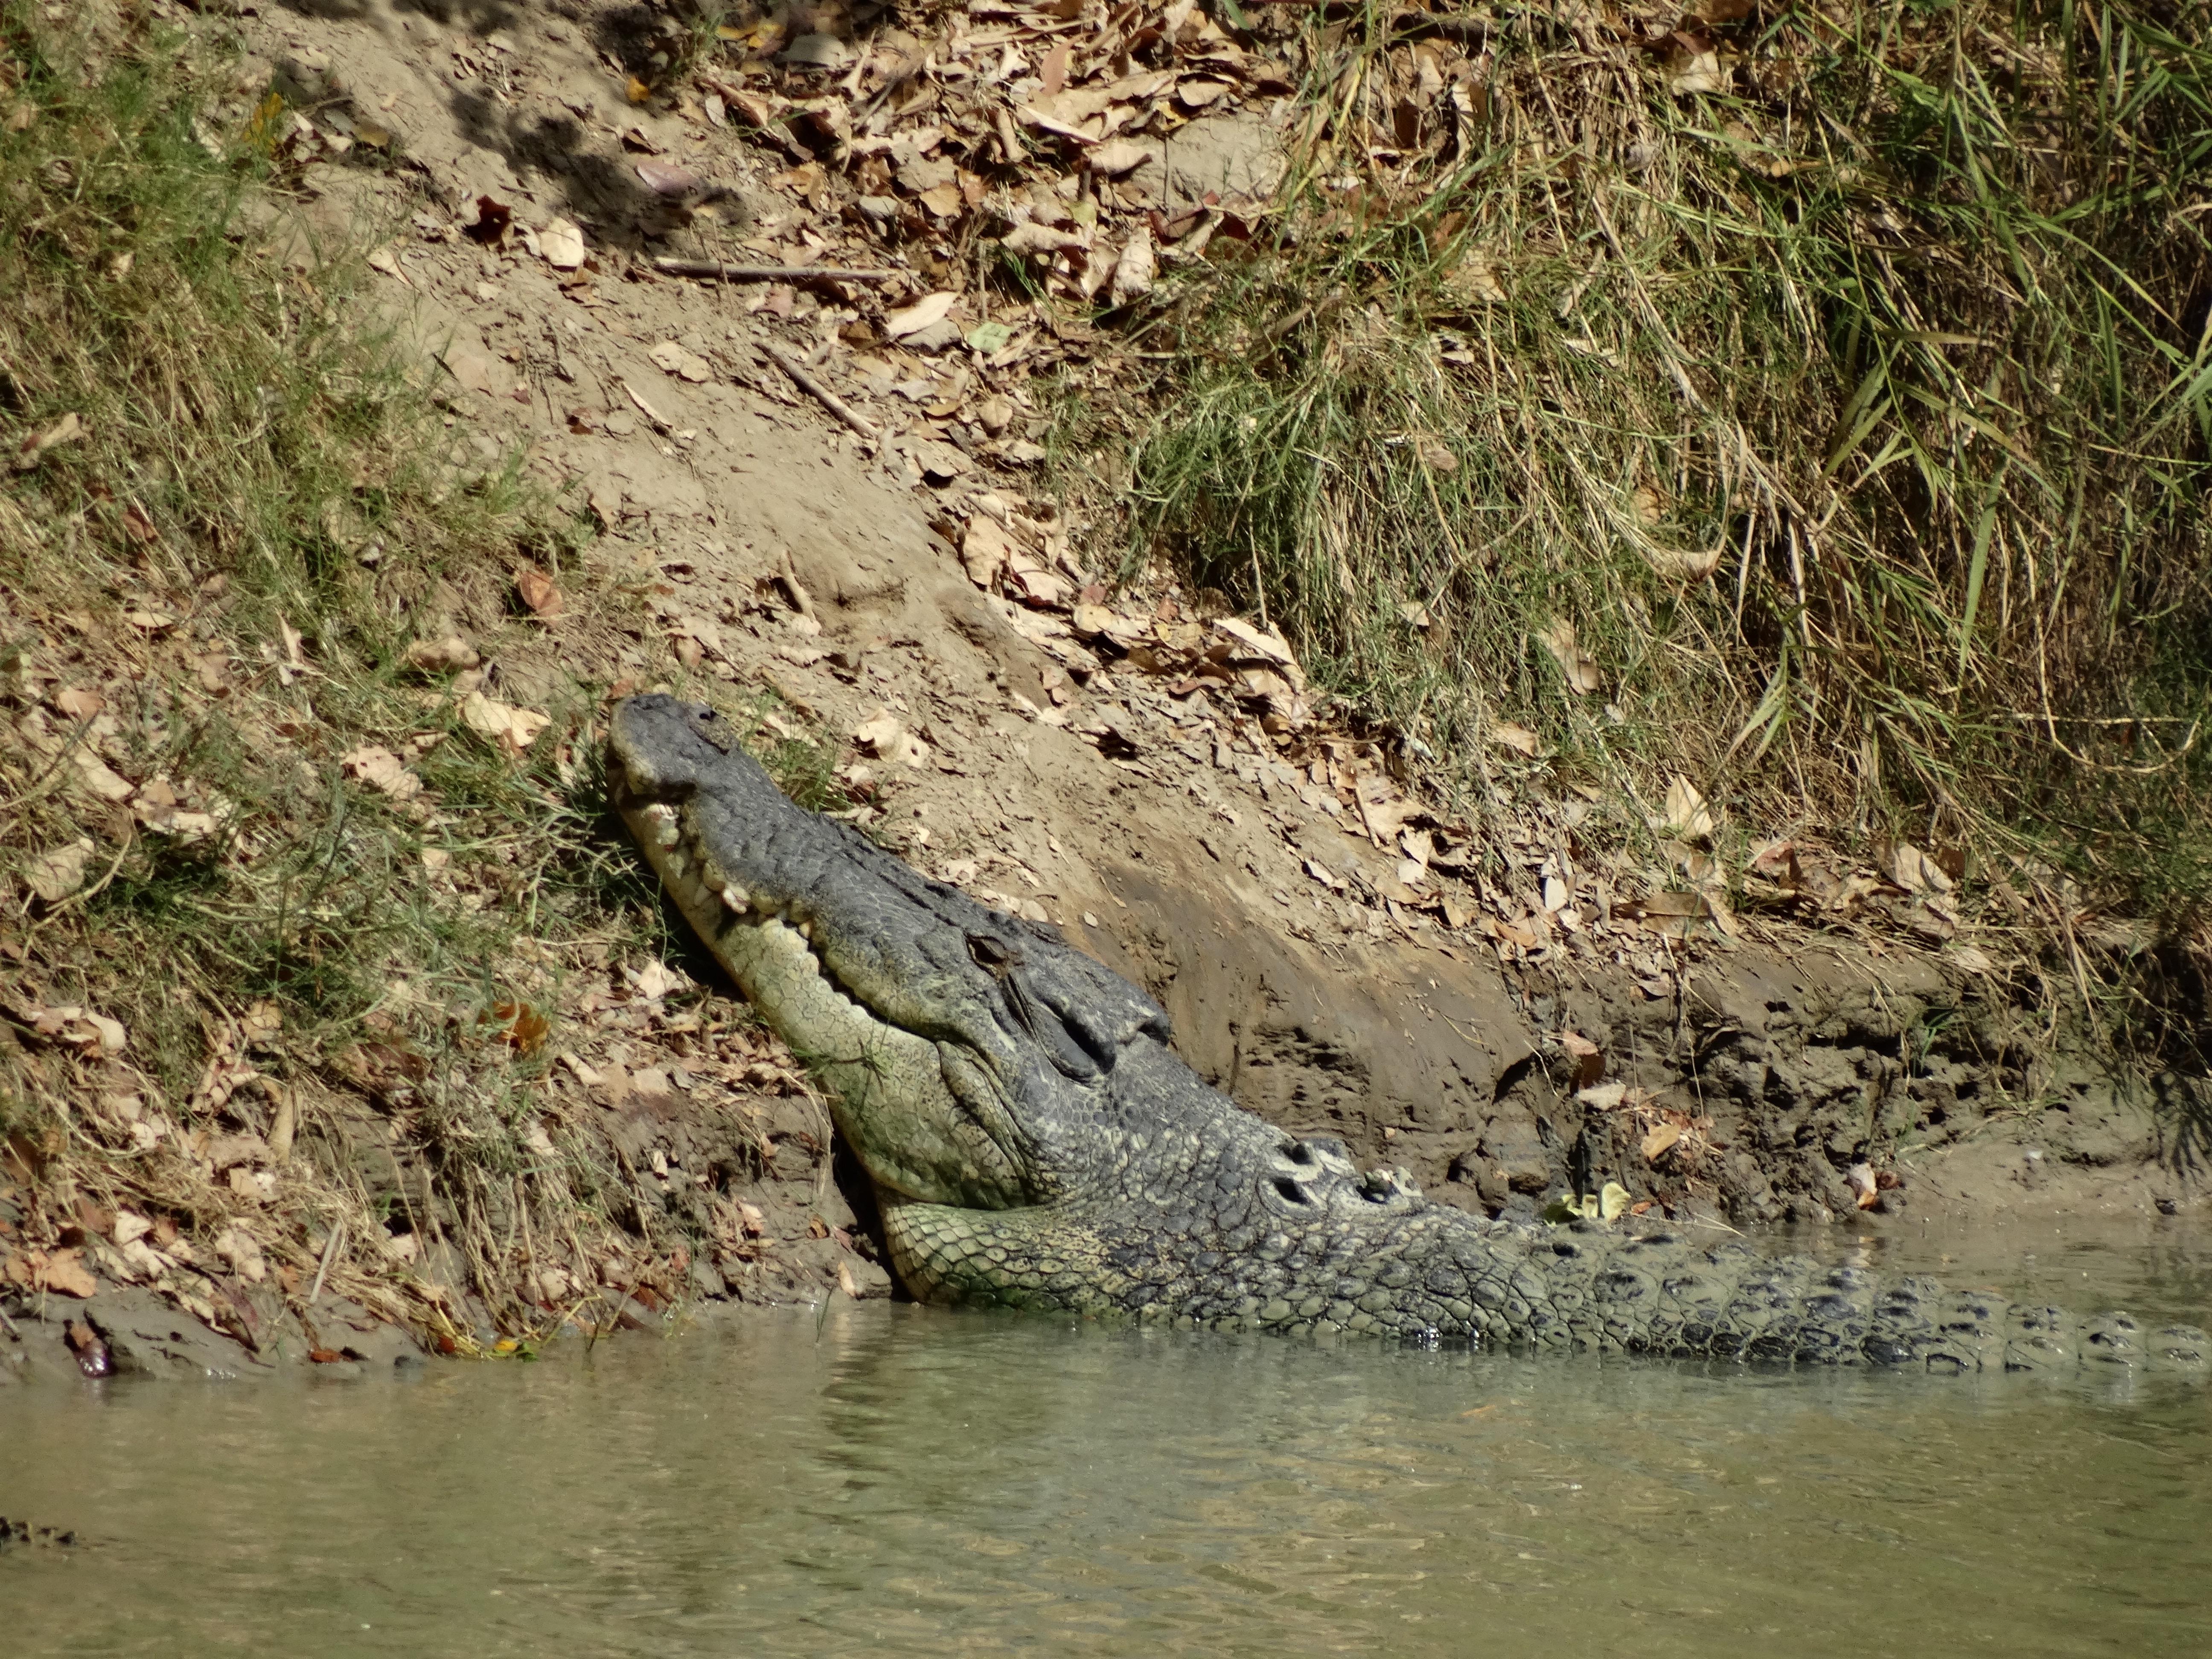 Massive saltwater croc